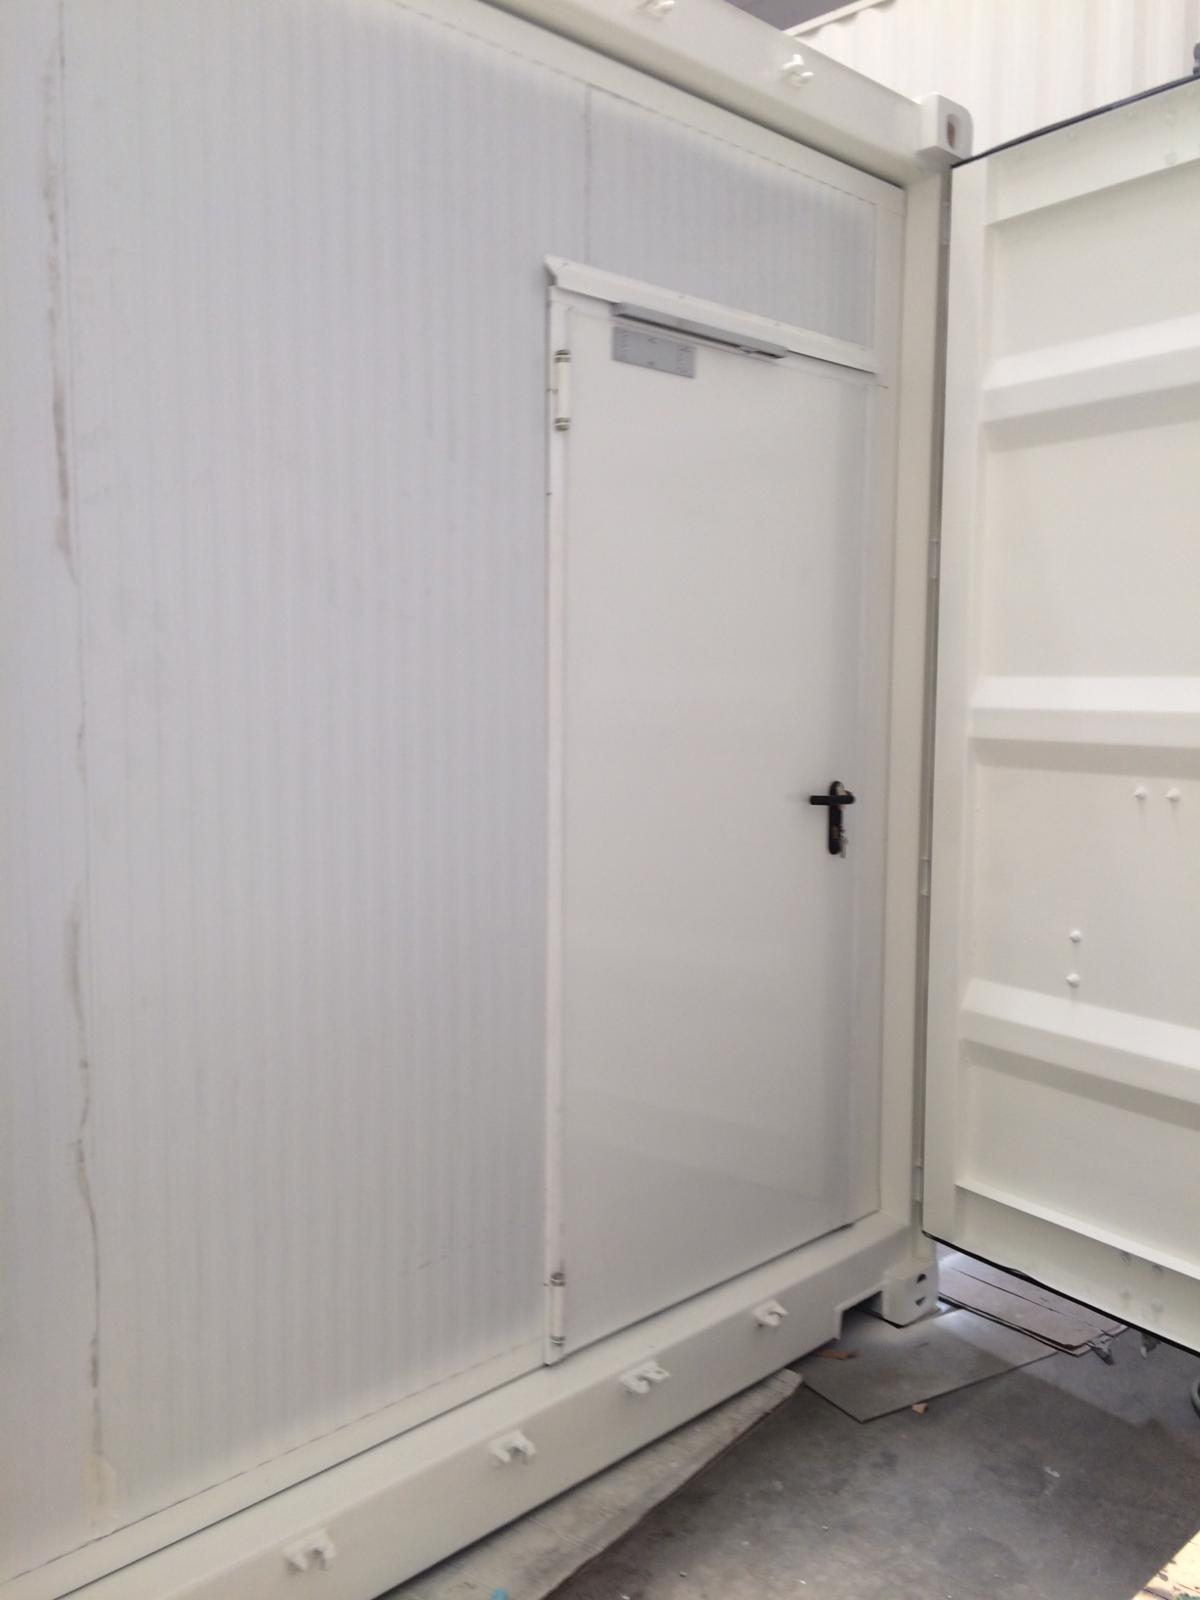 bullbox contenedores almacenamiento energia 02 - Containers for Energy Stockage